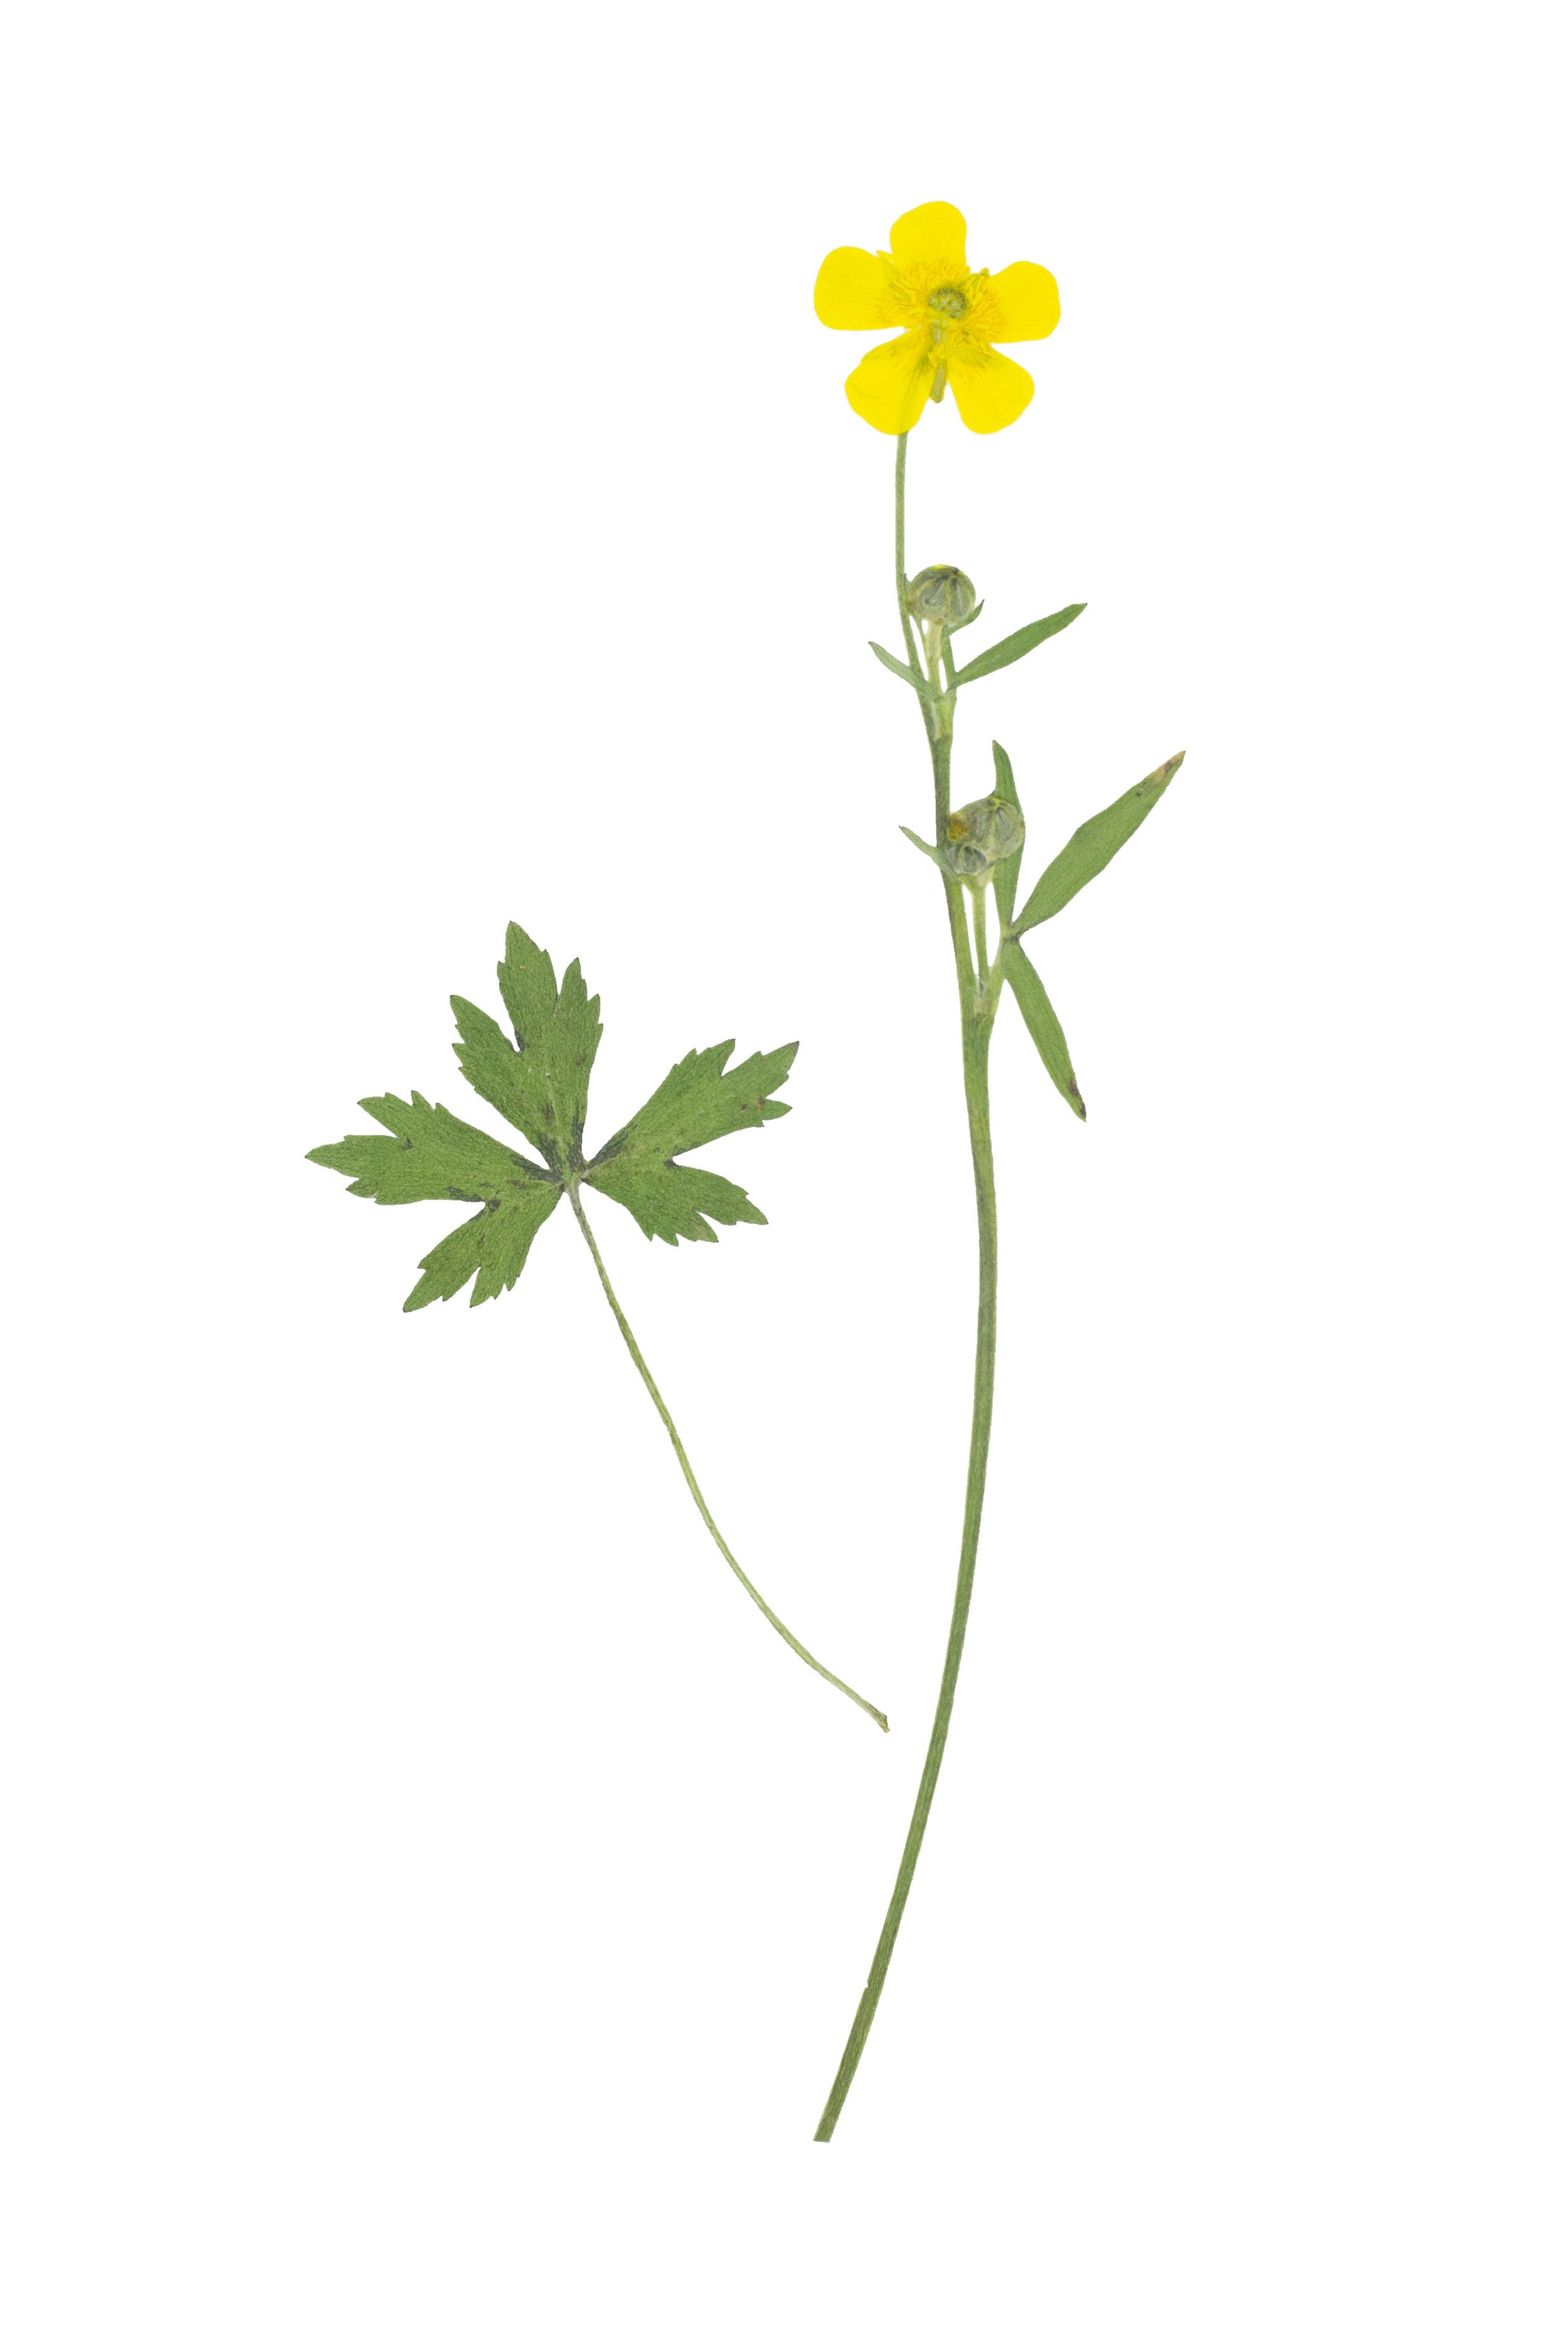 Meadow Buttercup / Ranunculus acris friesianus